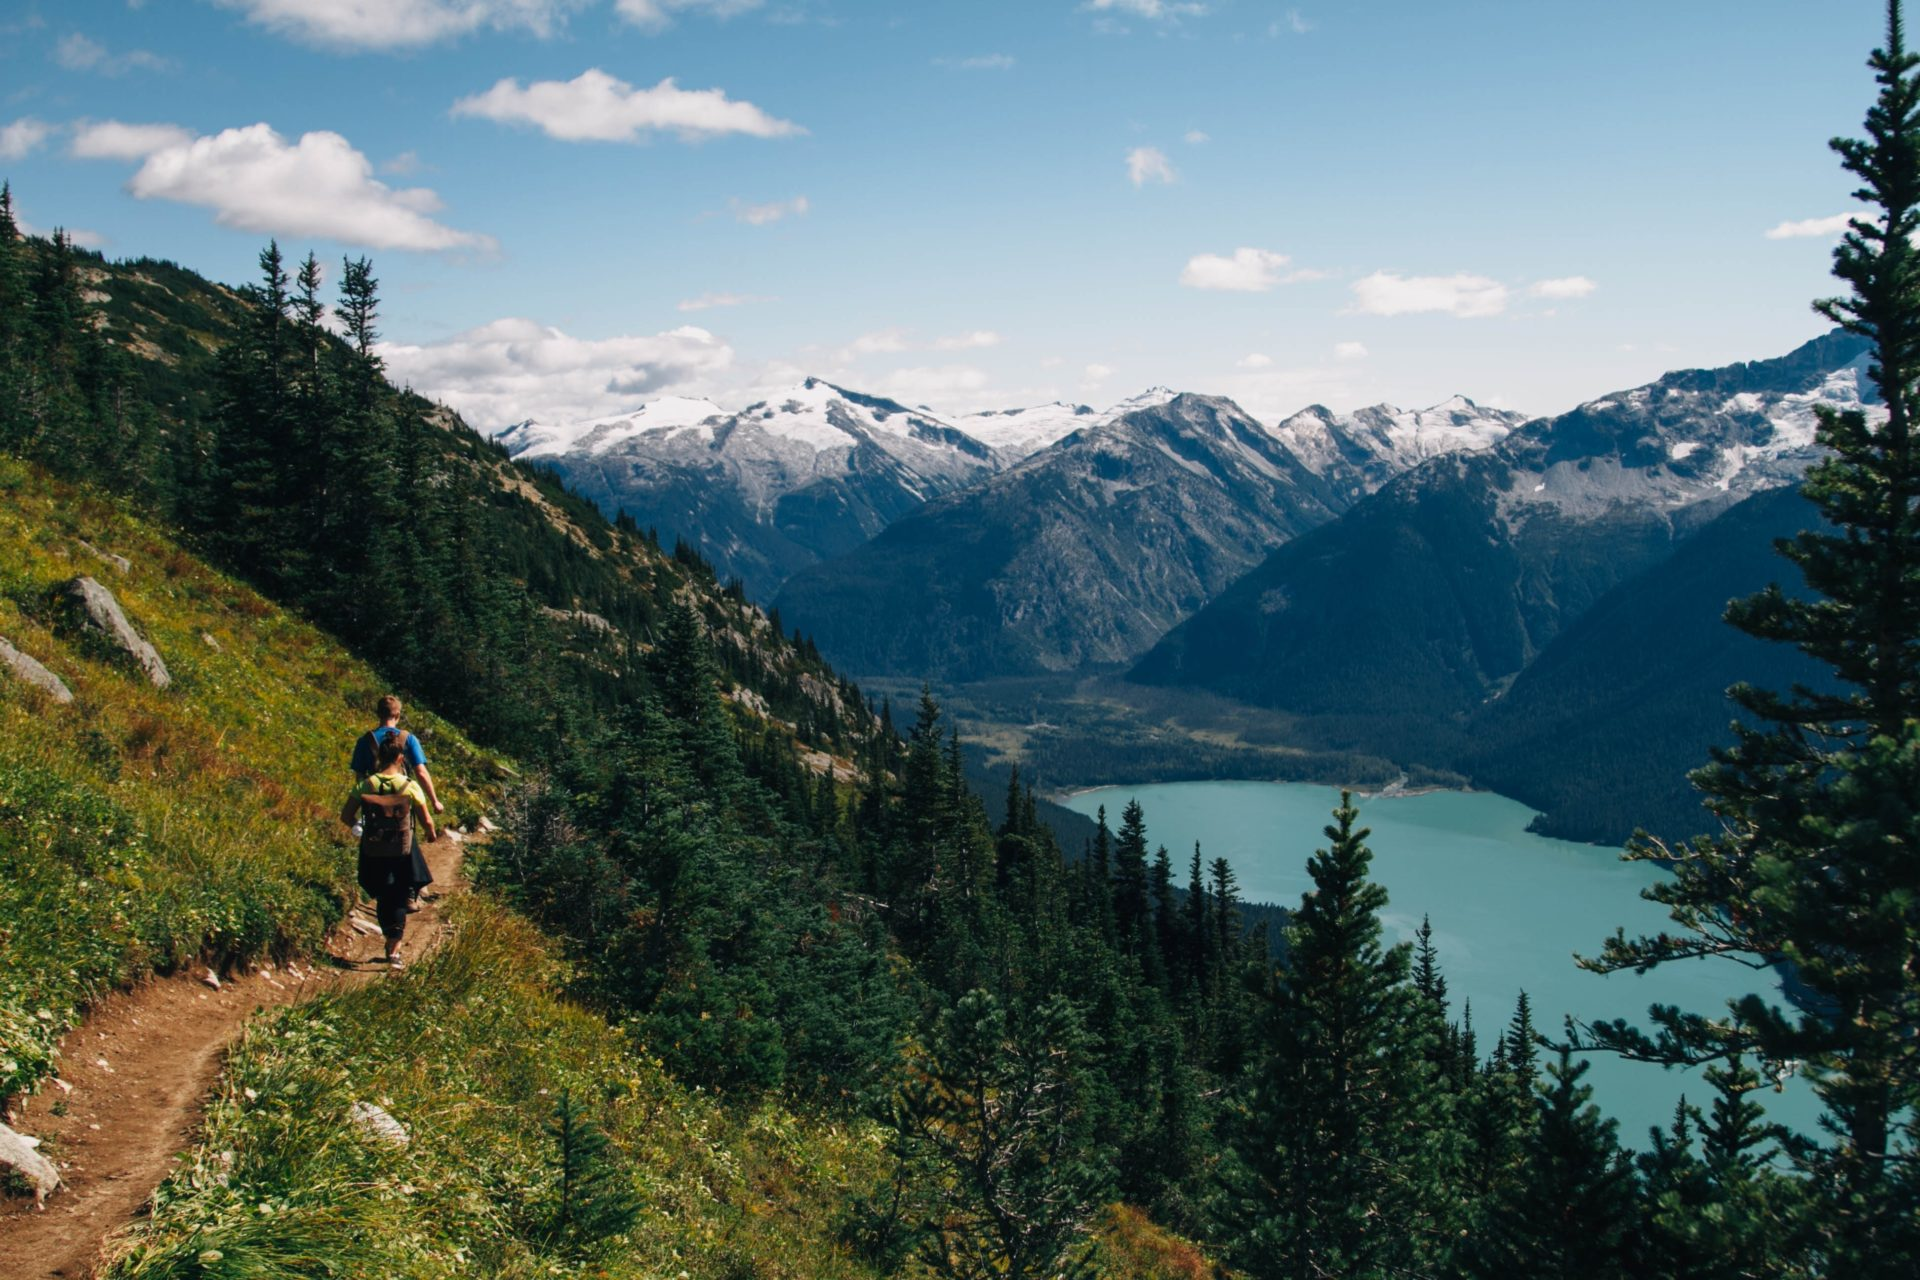 People Walking on Trails Alongside a Mountain Overlooking a Lake